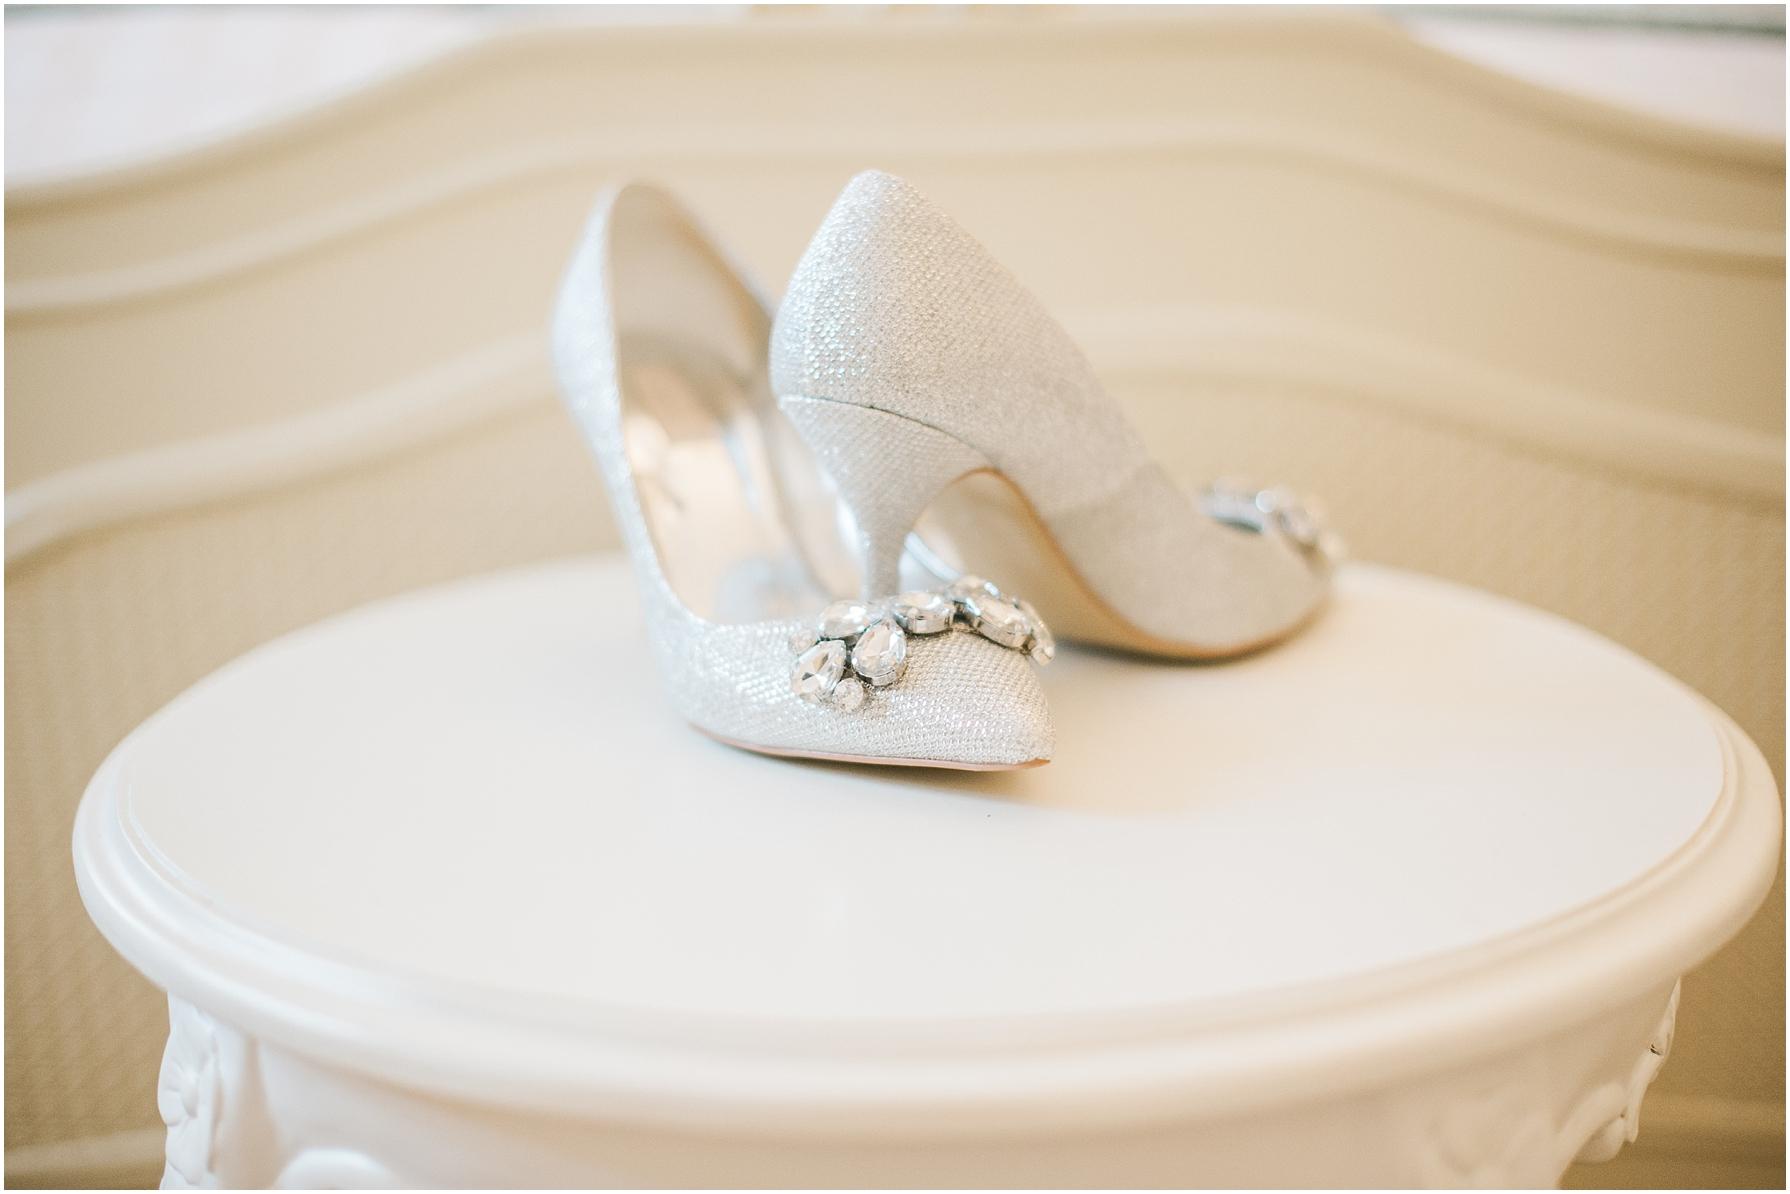 diamond wedding shoes on a white table